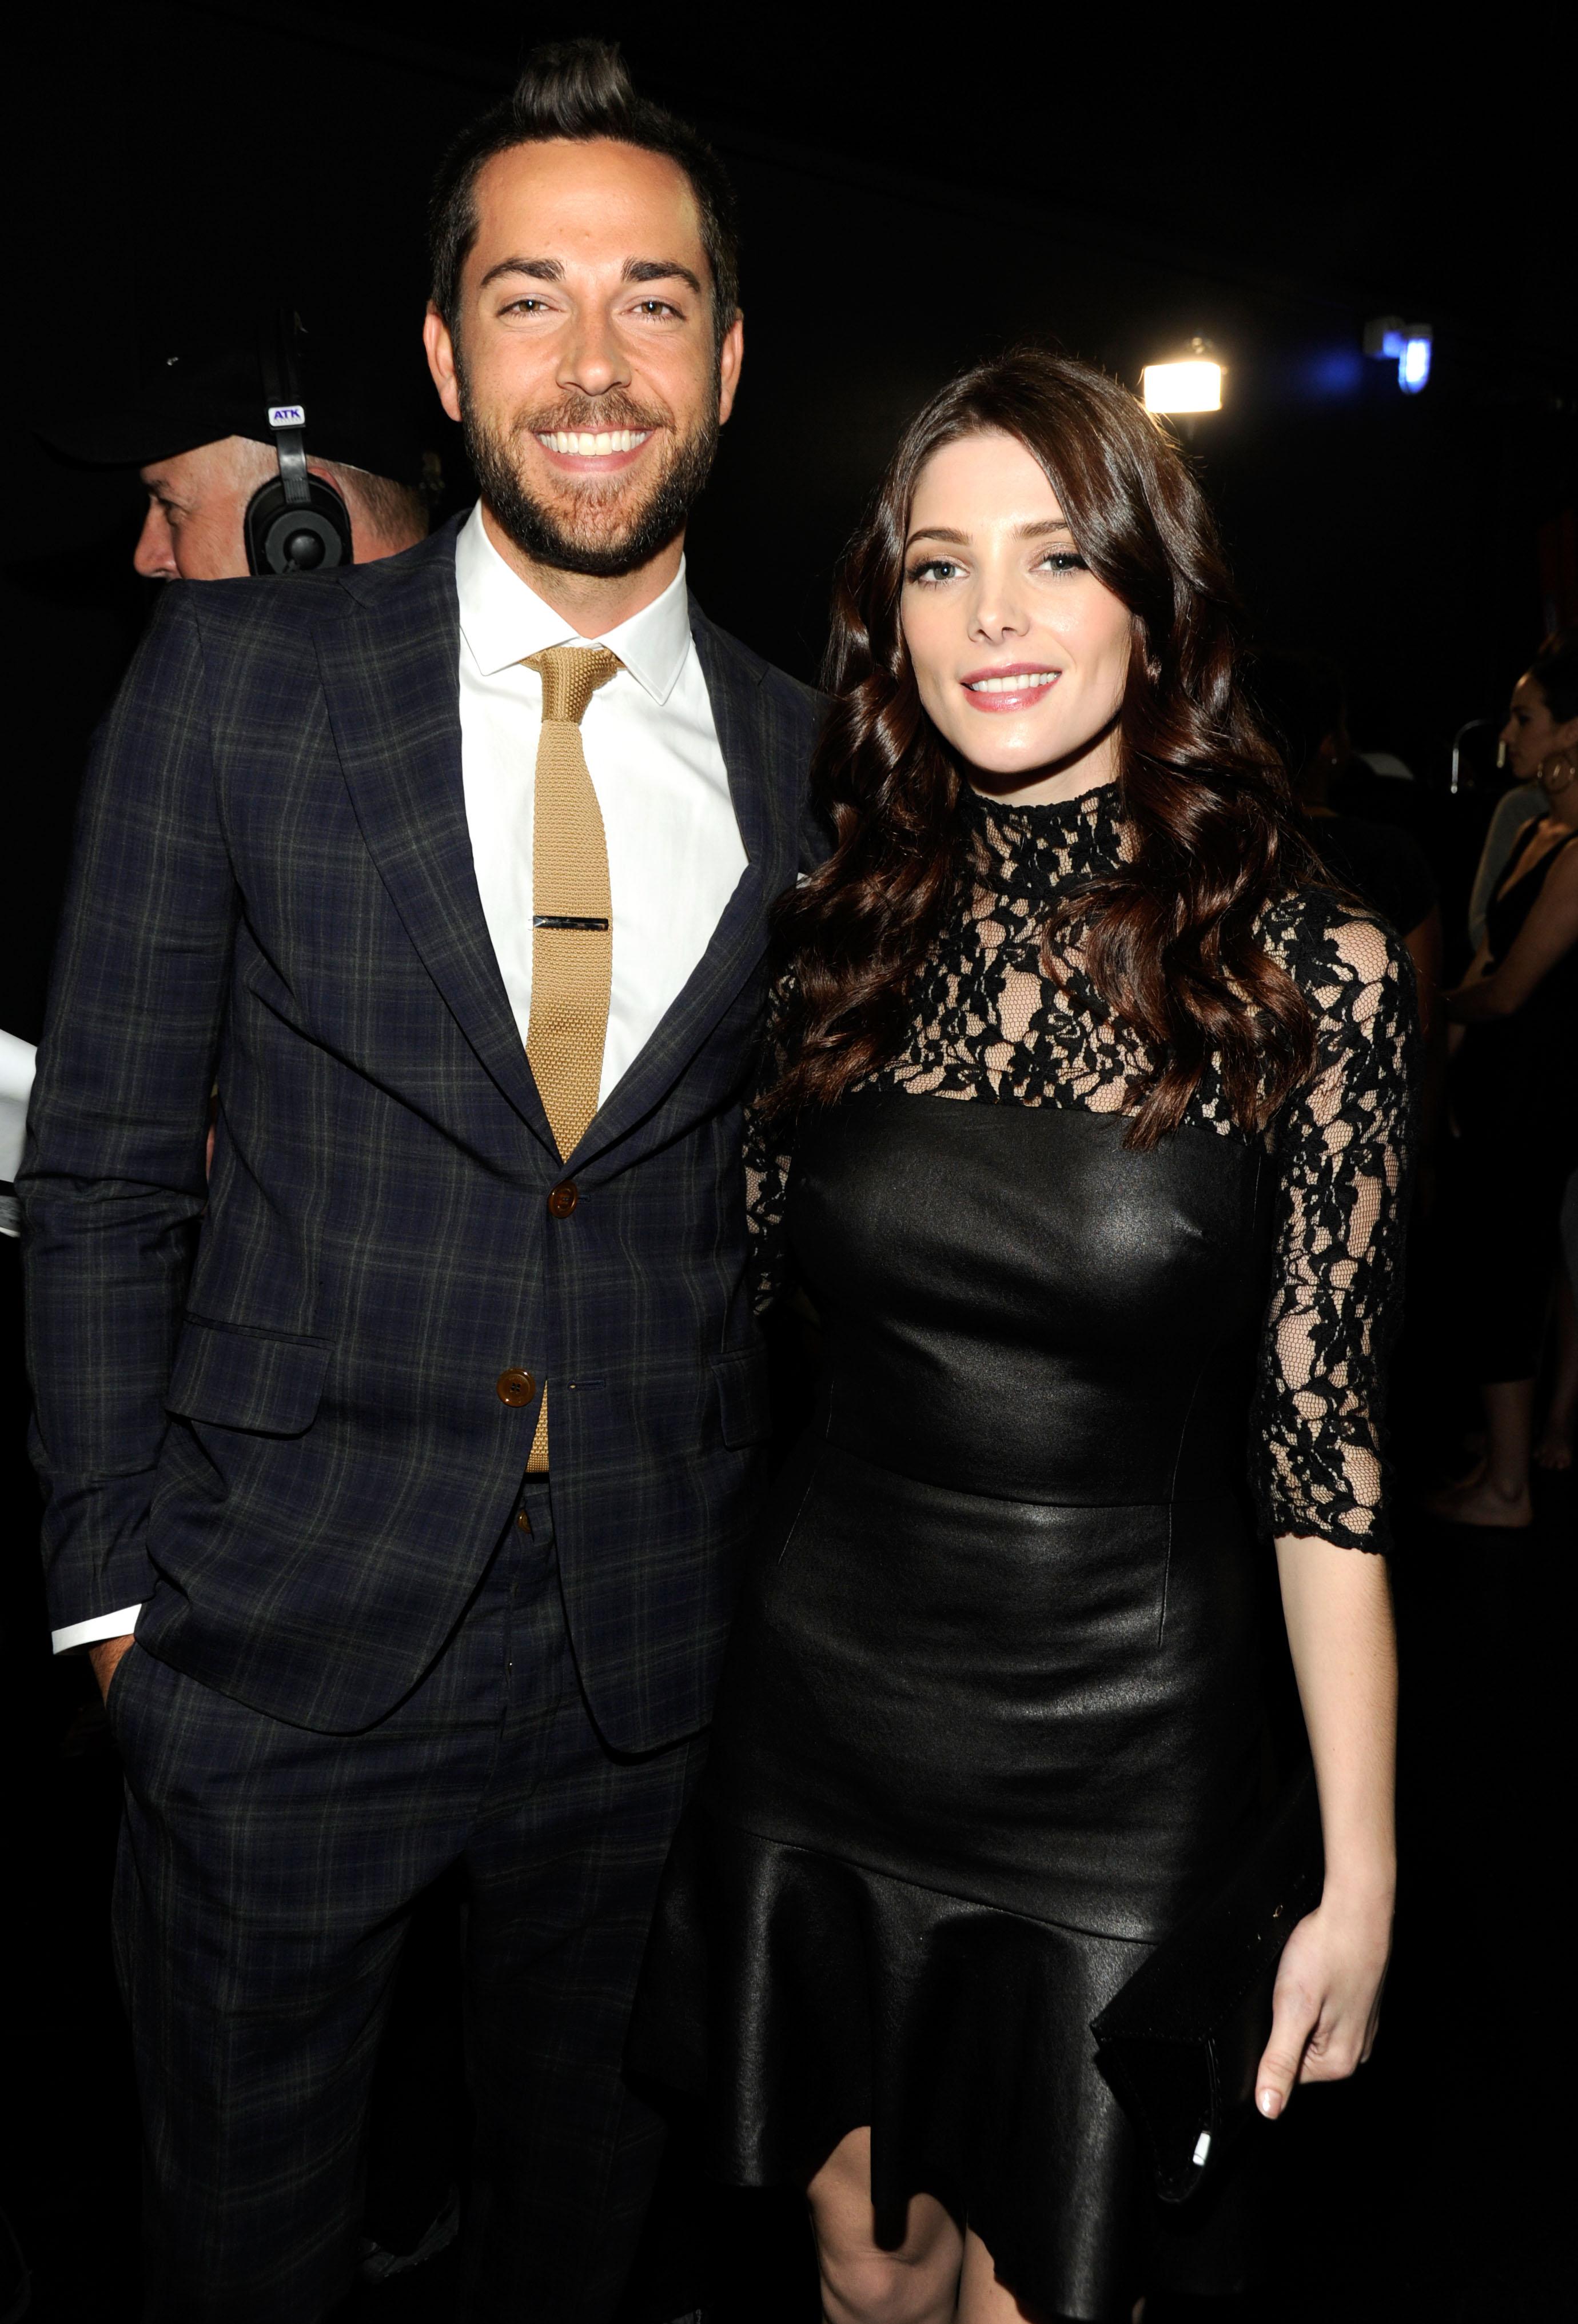 Zachary Levi and Ashley Greene